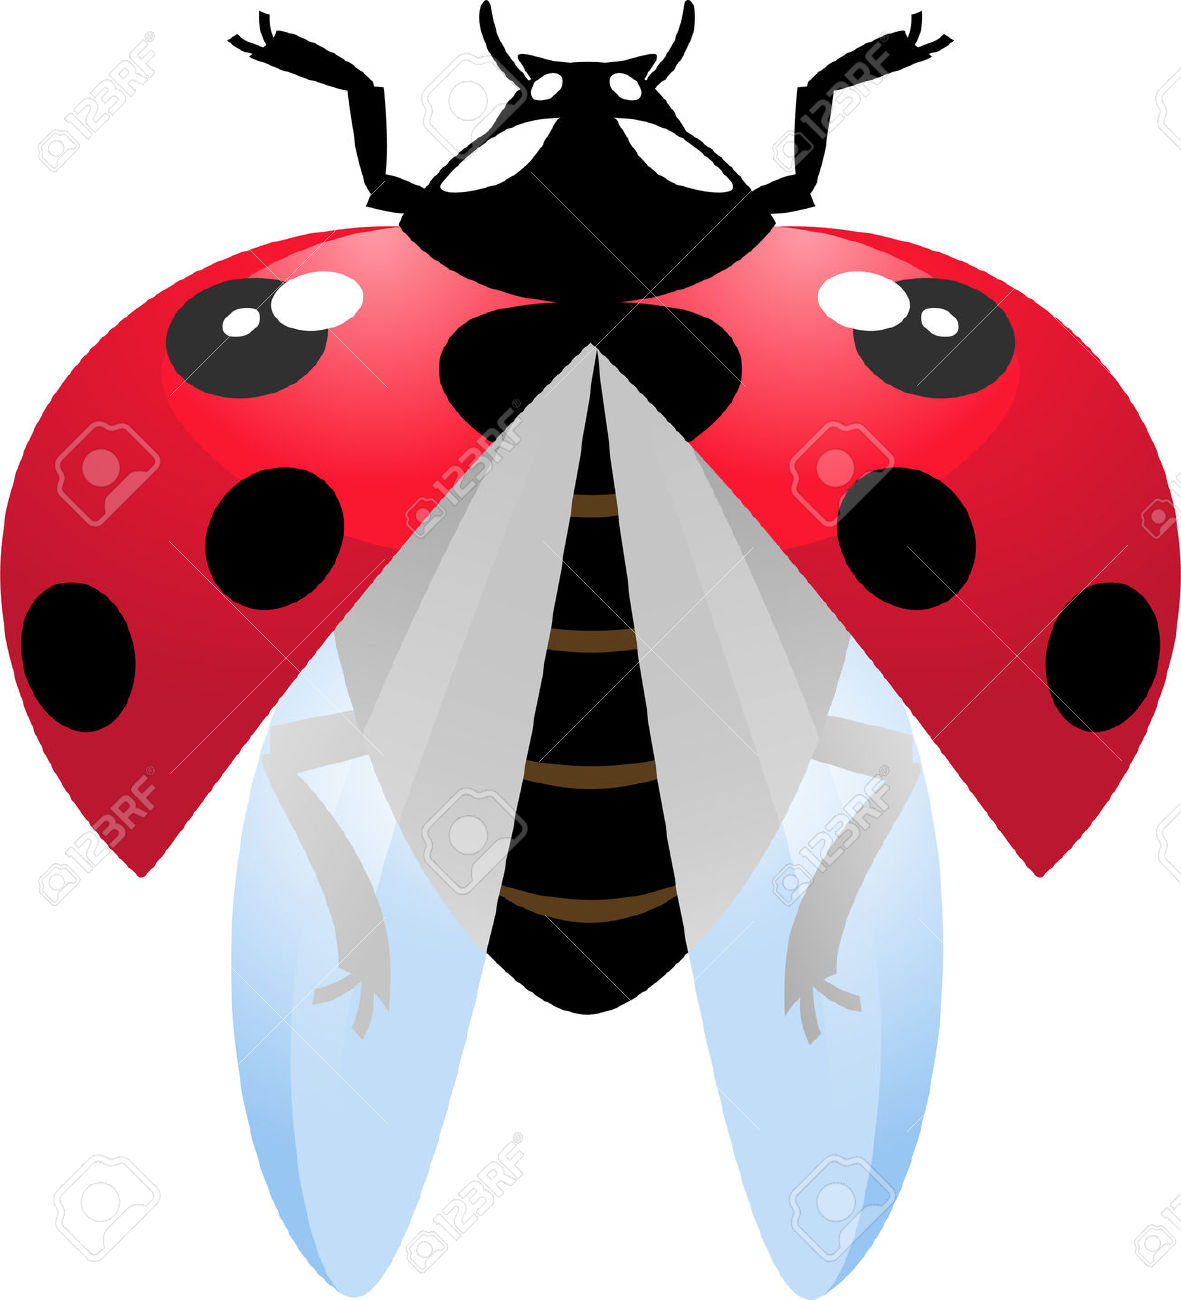 Ladybug clipart ladybug wing. Flying free download best